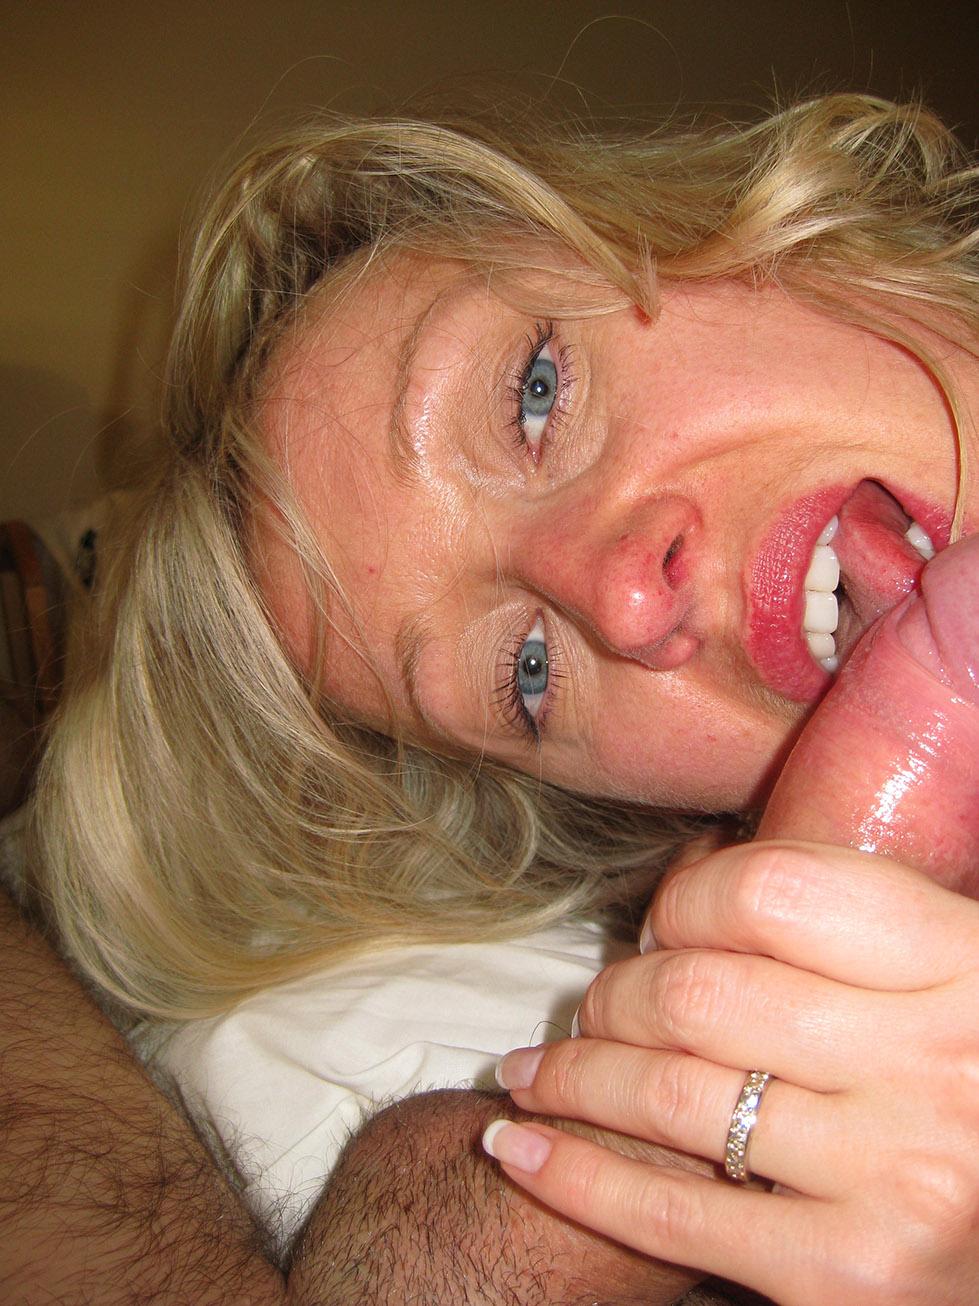 harte anal milfs